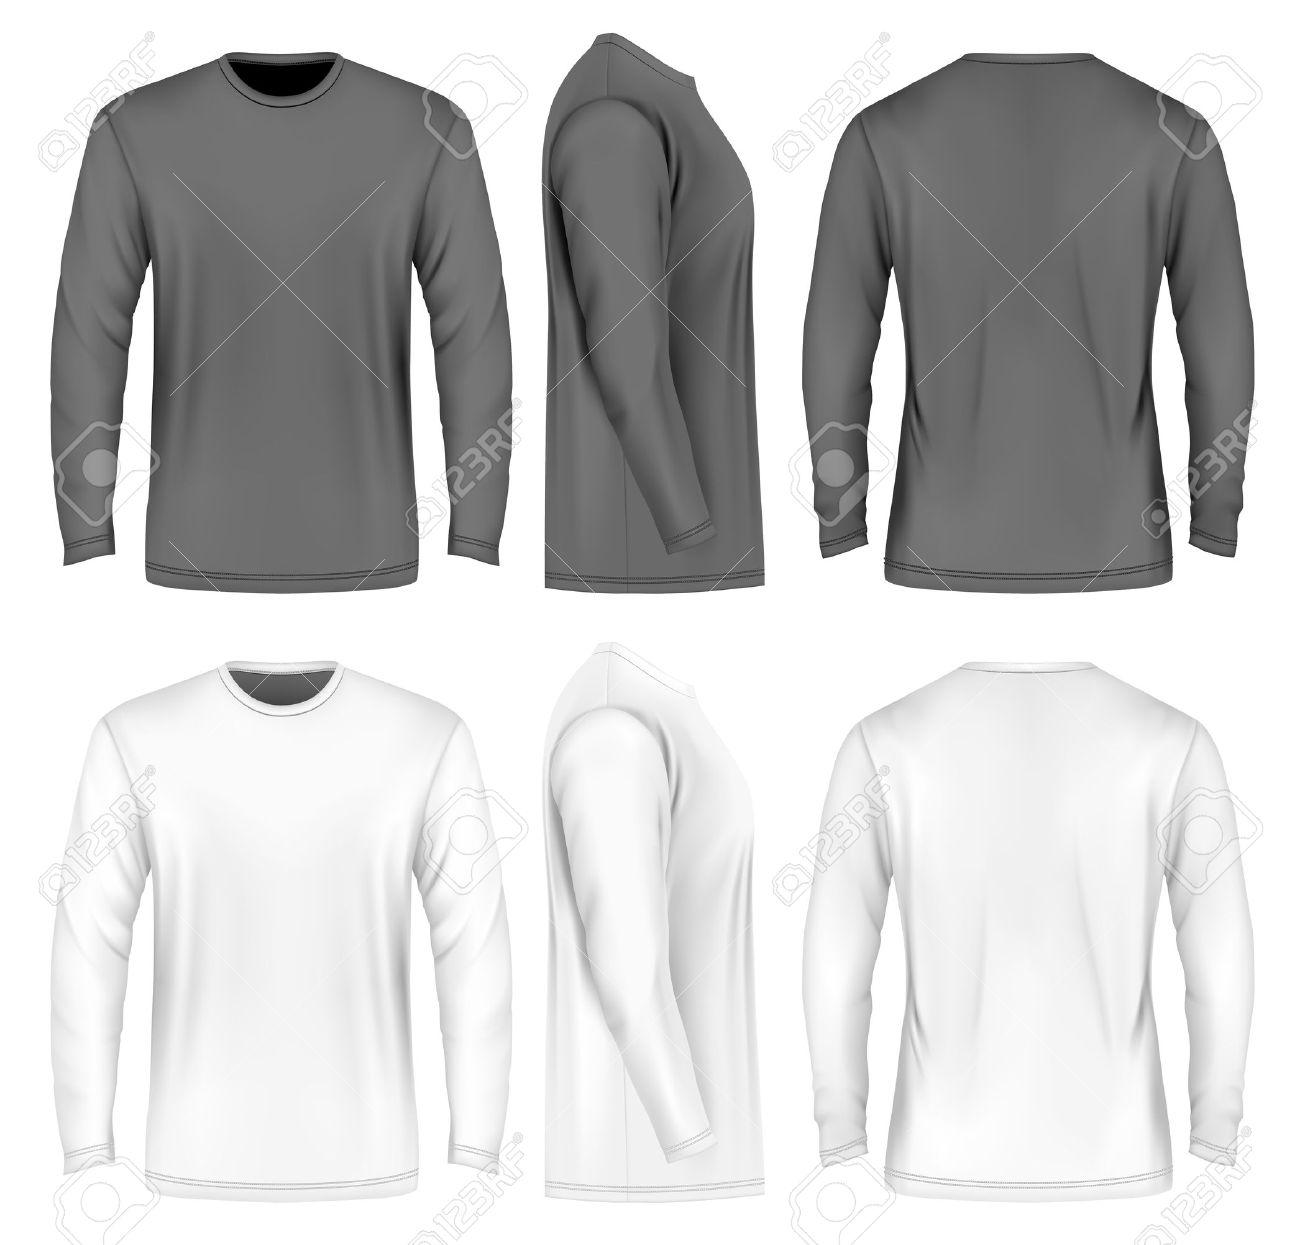 Men long sleeve t-shirt . Front, side and back views. Vector illustration. Fully editable handmade mesh. Black and white variants. - 52421470